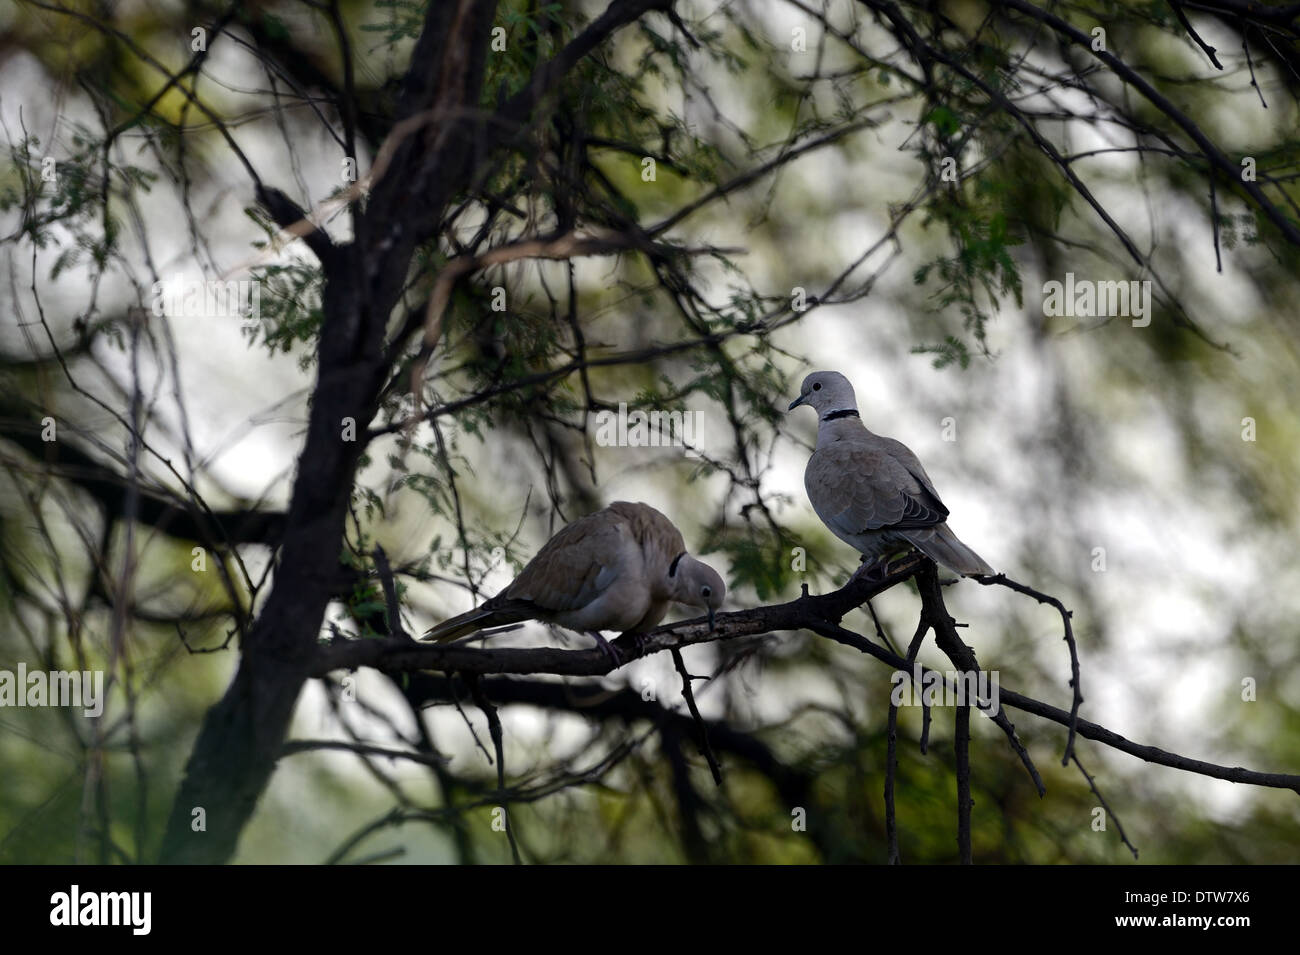 Sultanpur Bird Sanctuary, Gurgaon, Haryana, India Immagini Stock